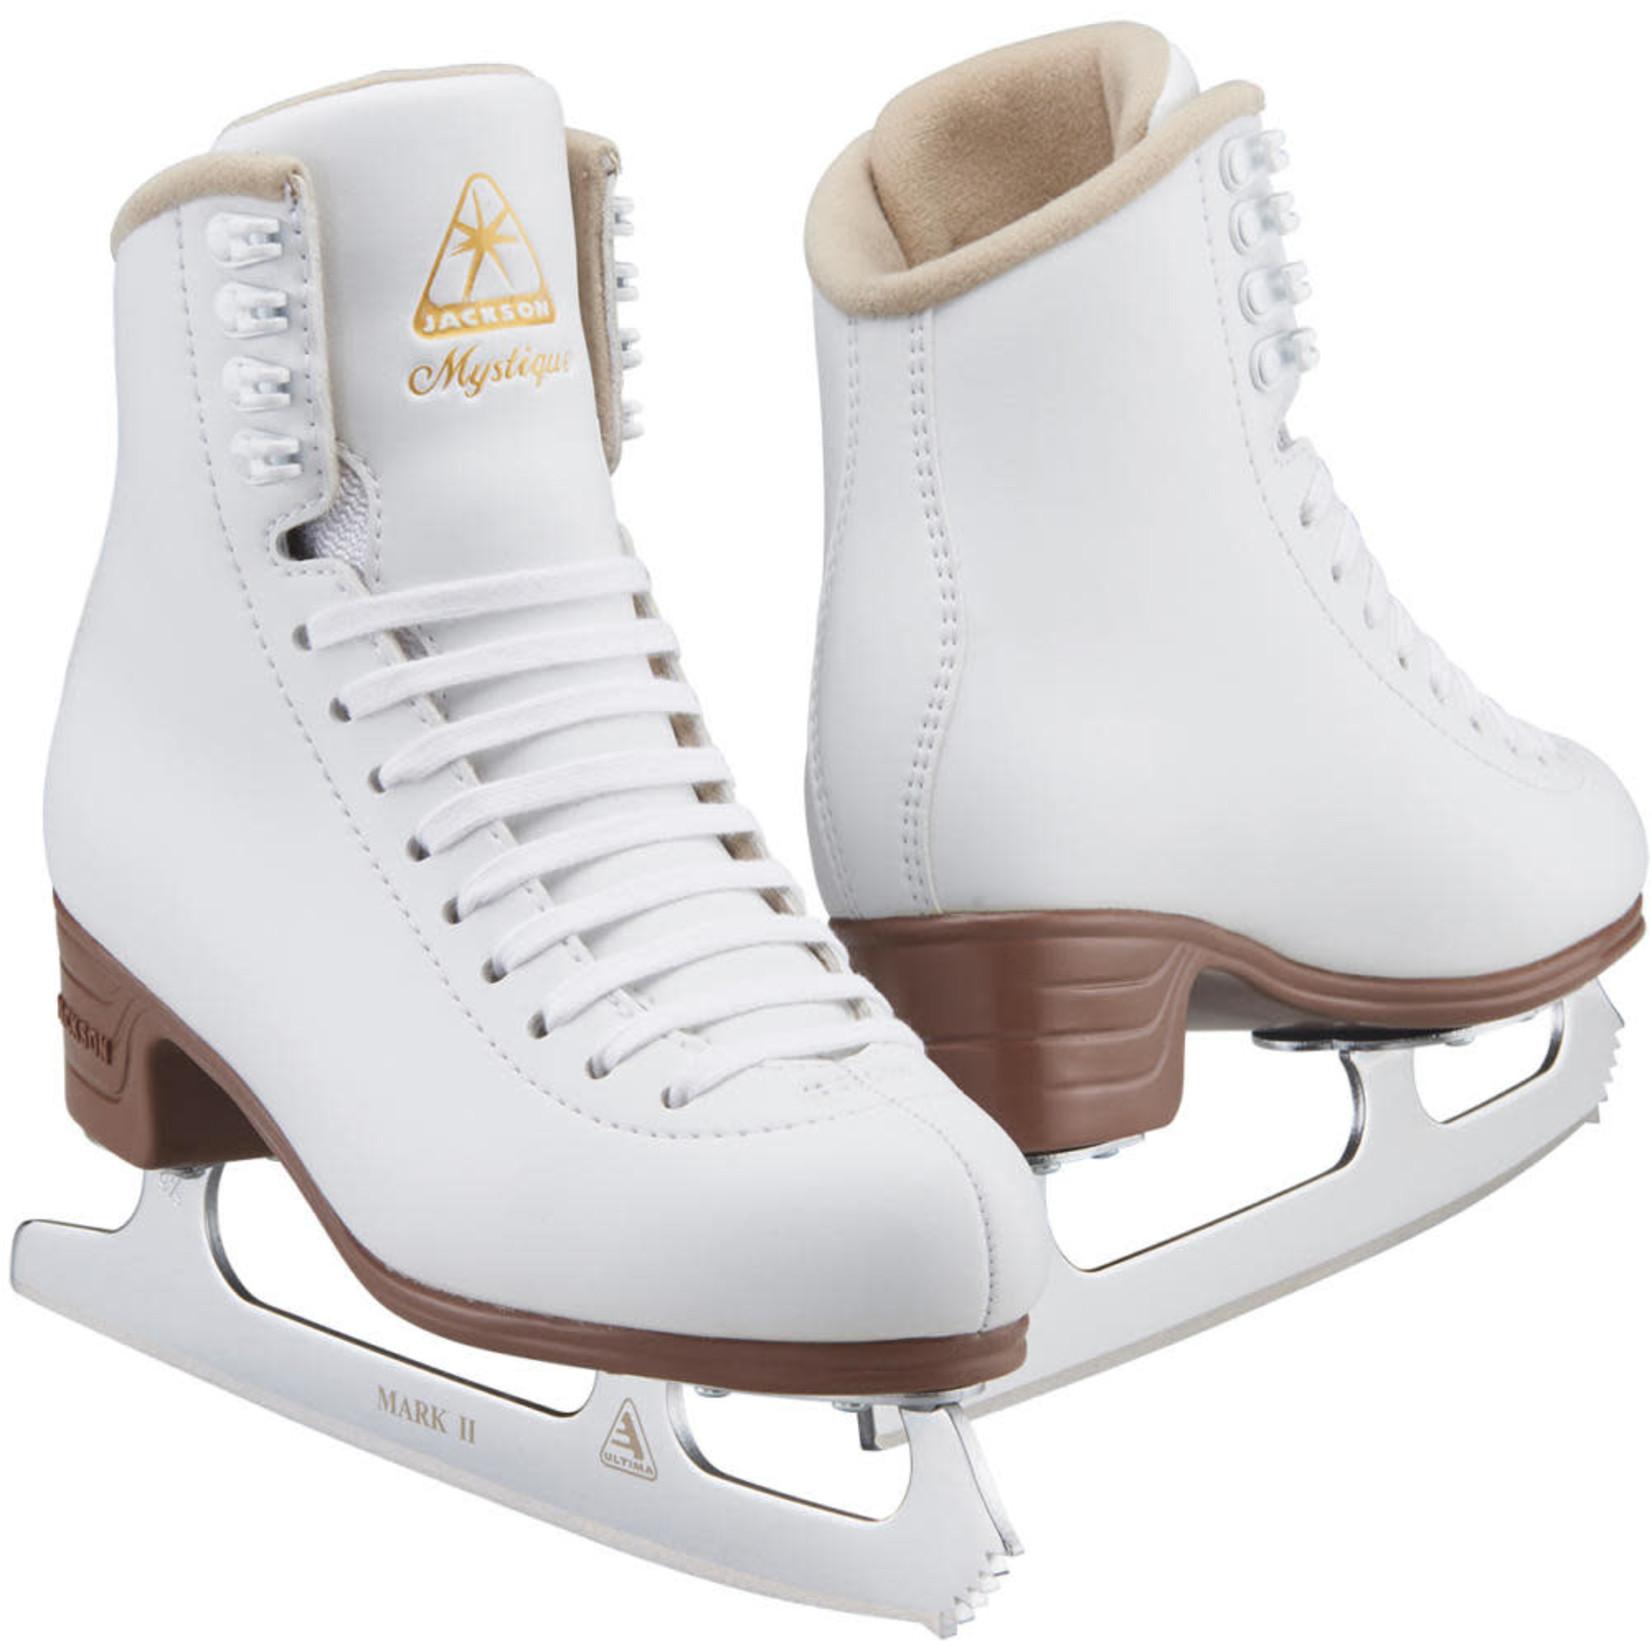 Jackson Jackson Figure Skates, Mystique JS1490, Ladies